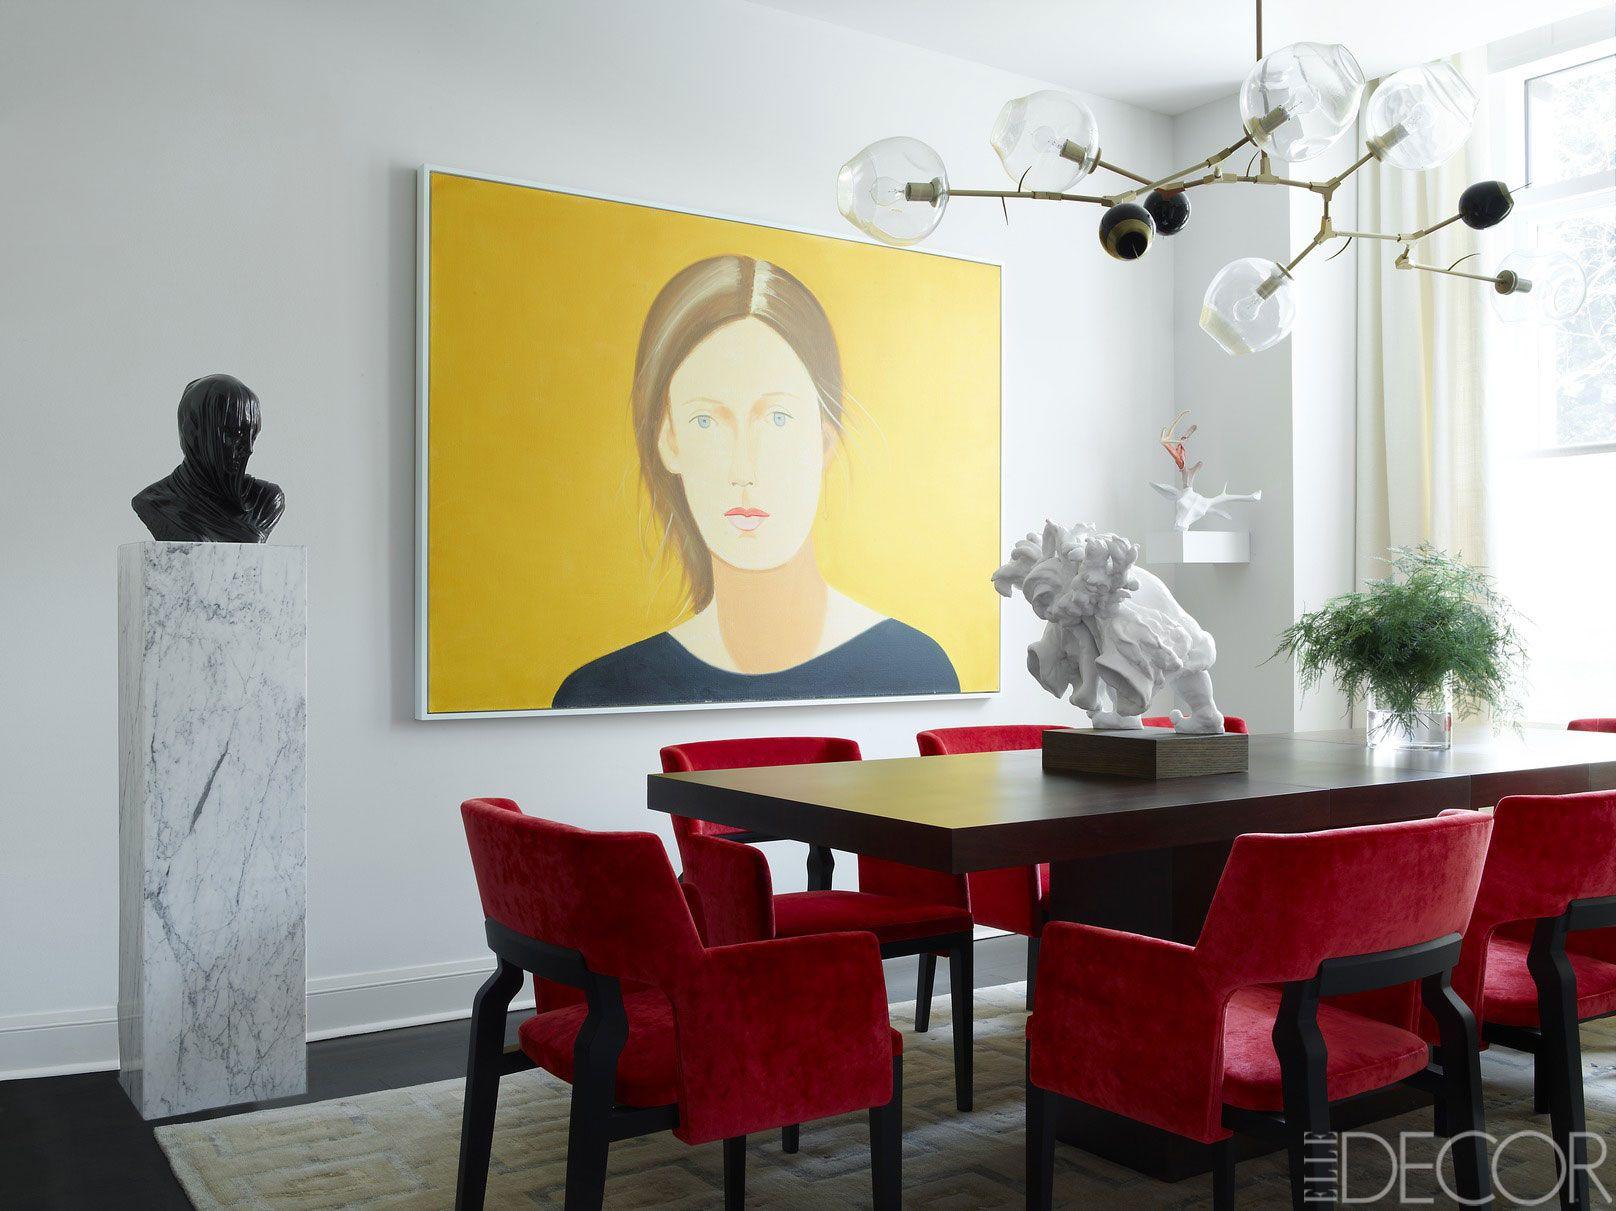 HOUSE TOUR: A Pair Of Fashion Mavens\' Wildly Creative NYC Duplex ...